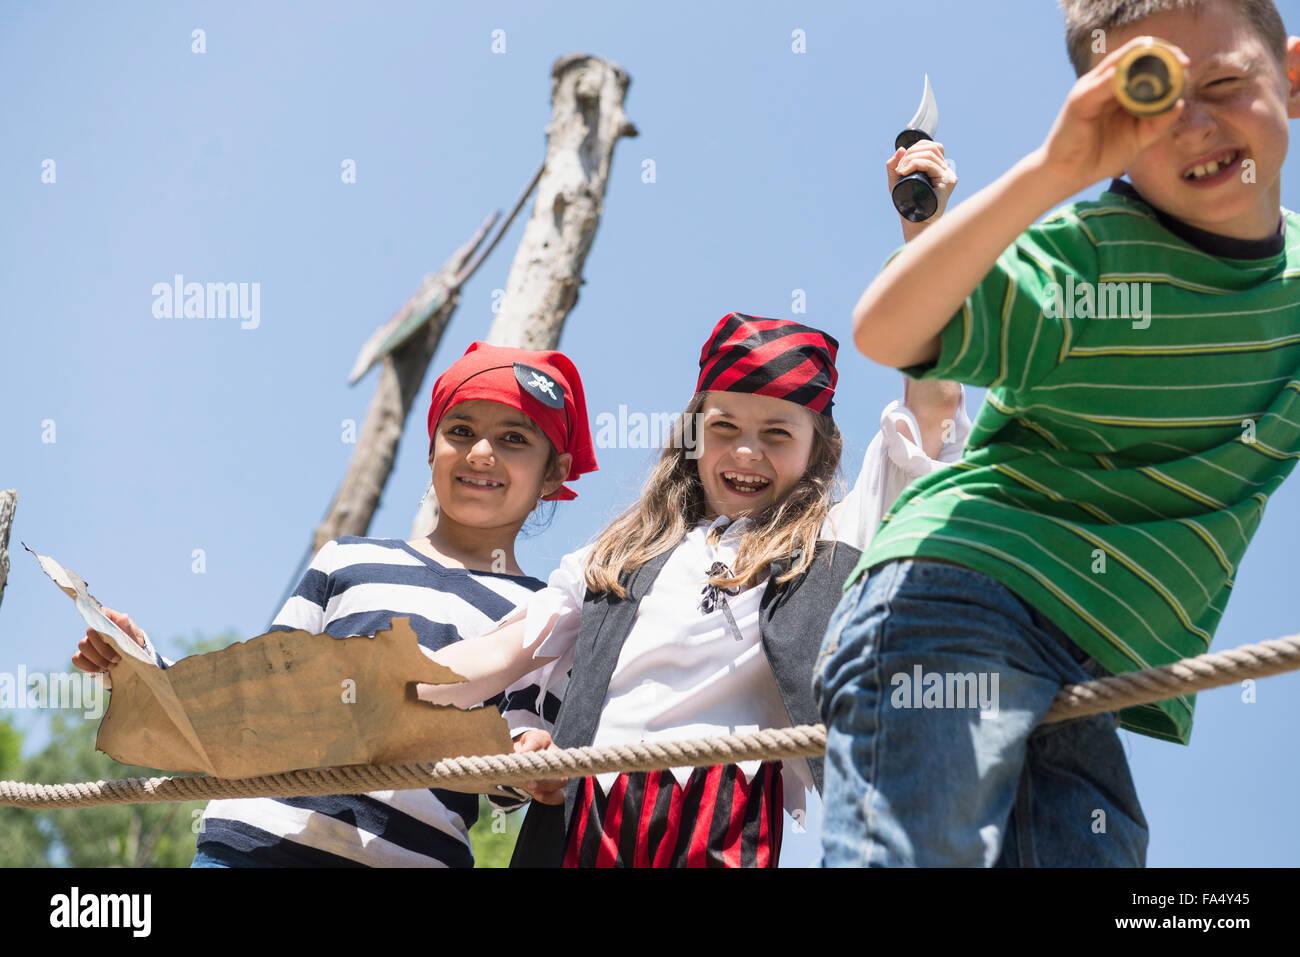 Children playing pirate game in adventure playground, Bavaria, Germany - Stock Image